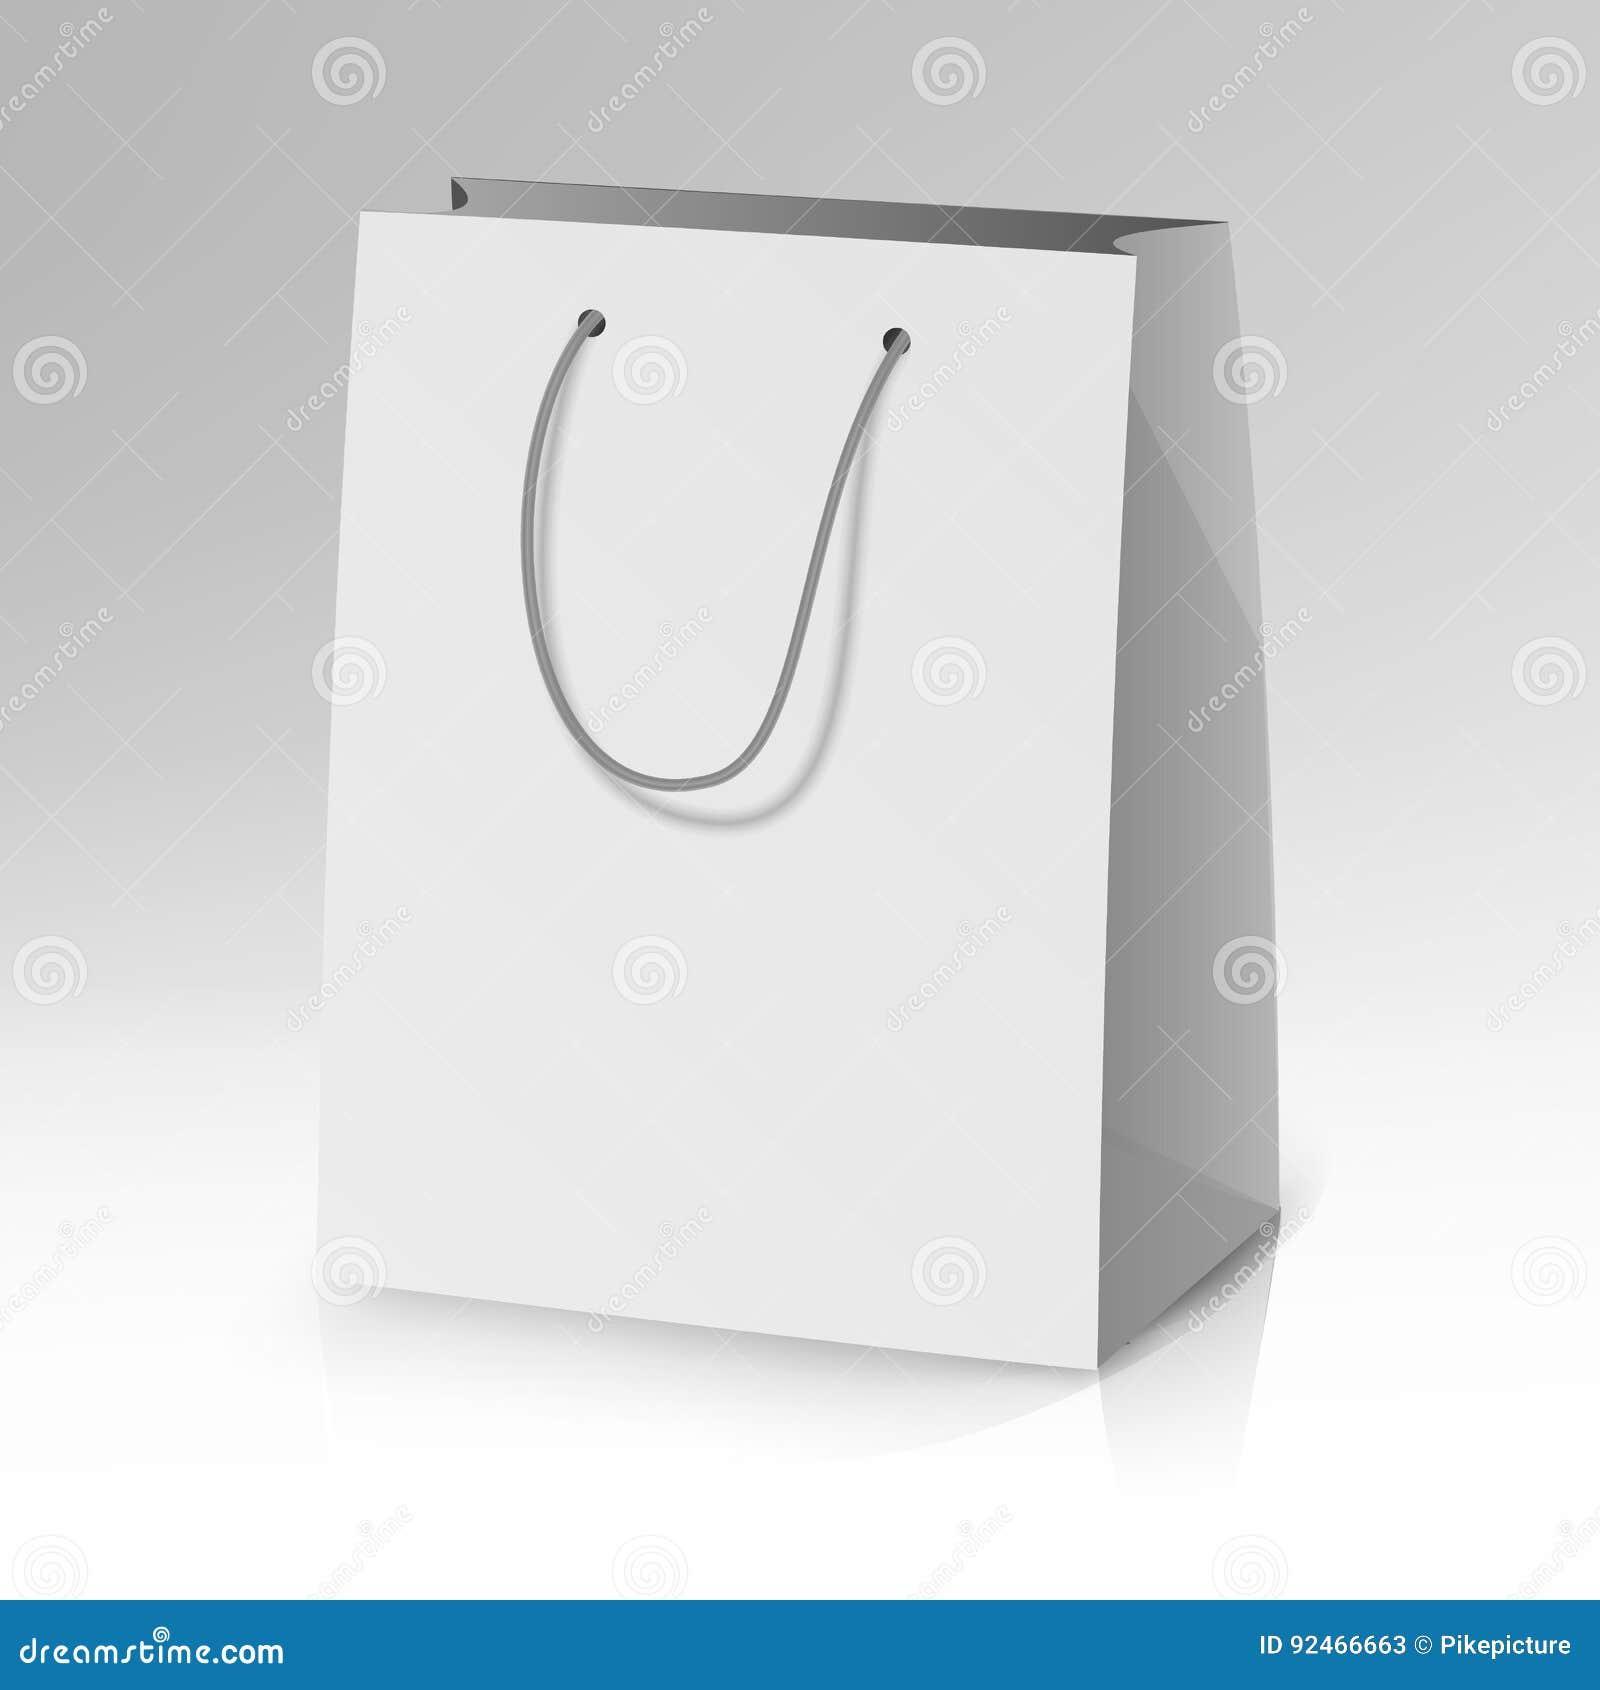 Blank Paper Bag Template Vector. Realistic Shopping Pocket Bag Illustration